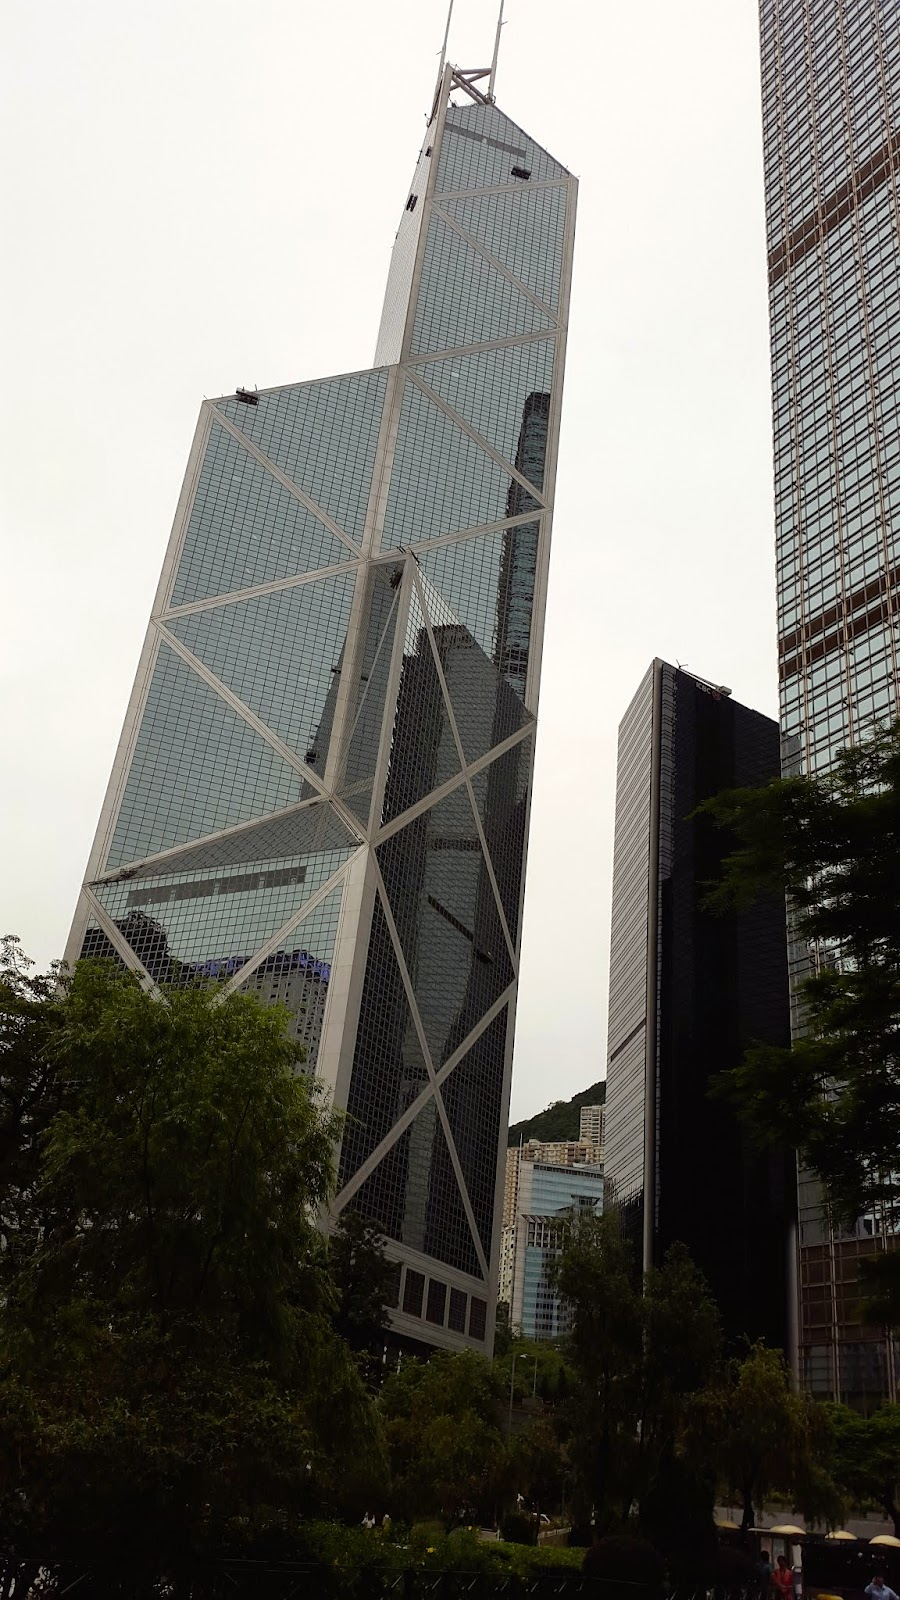 Central Hong Kong Skyscrapers